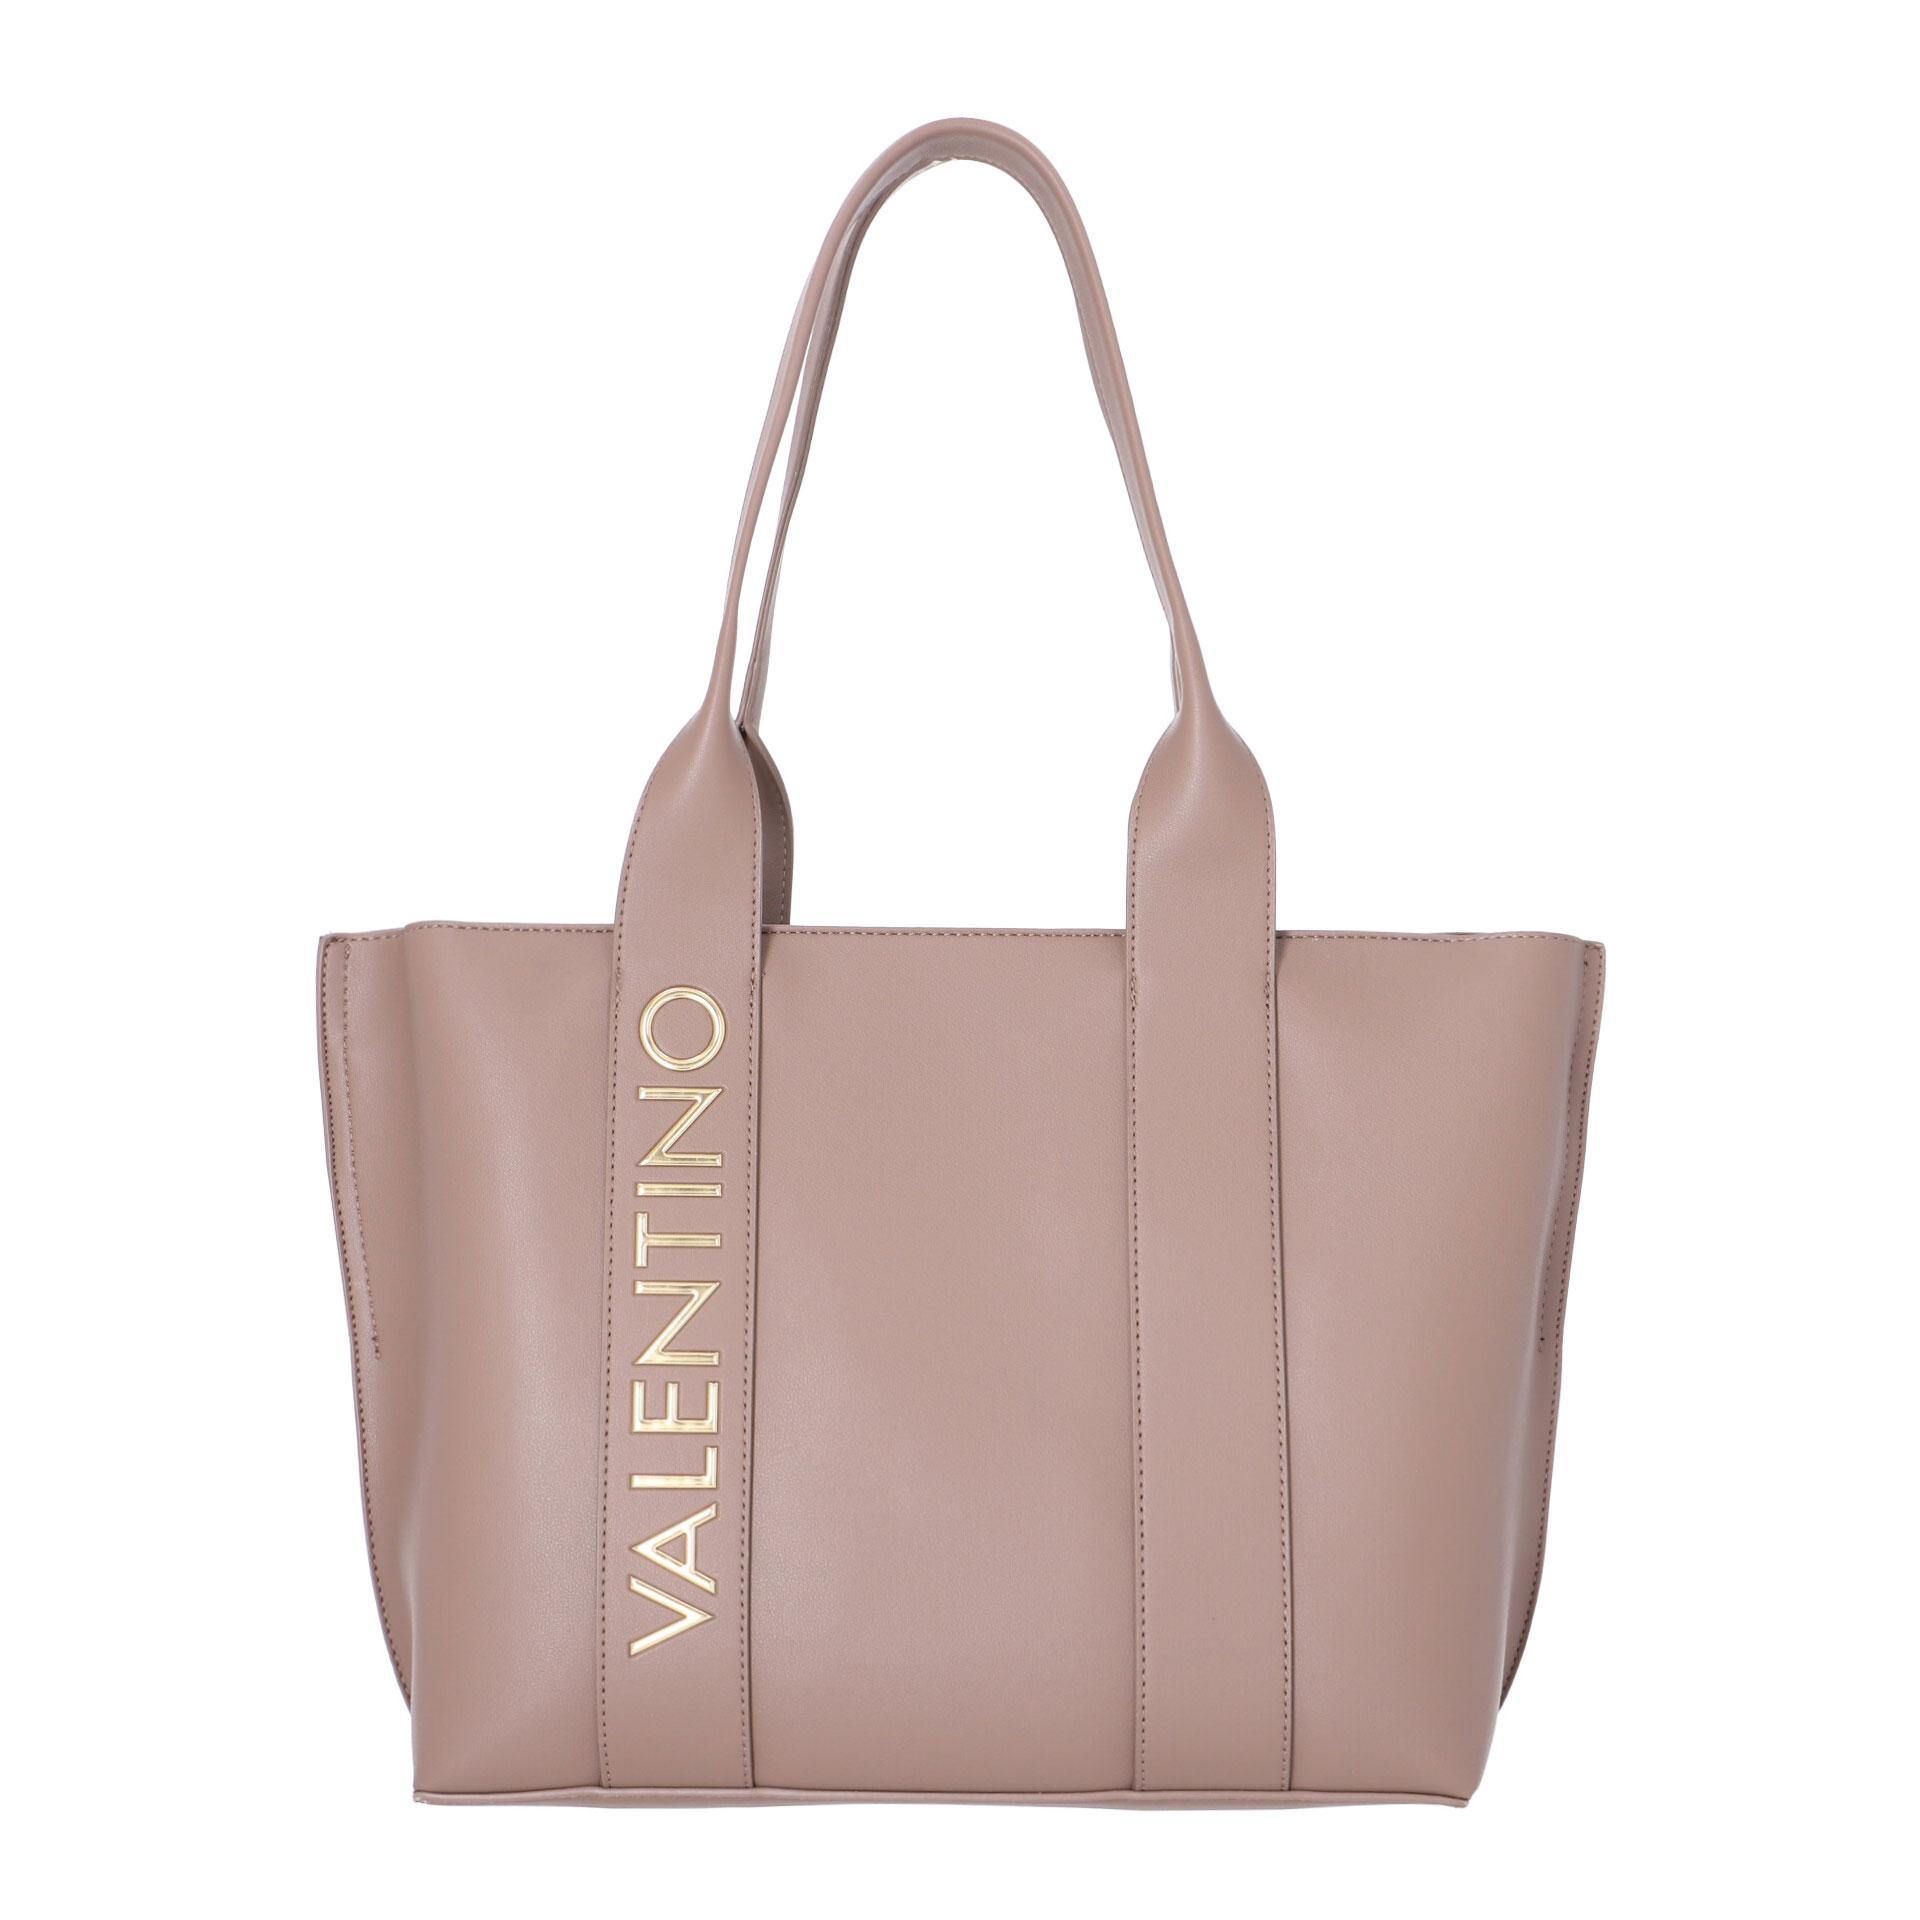 Valentino by Mario Valentino Olive Shopper taupe